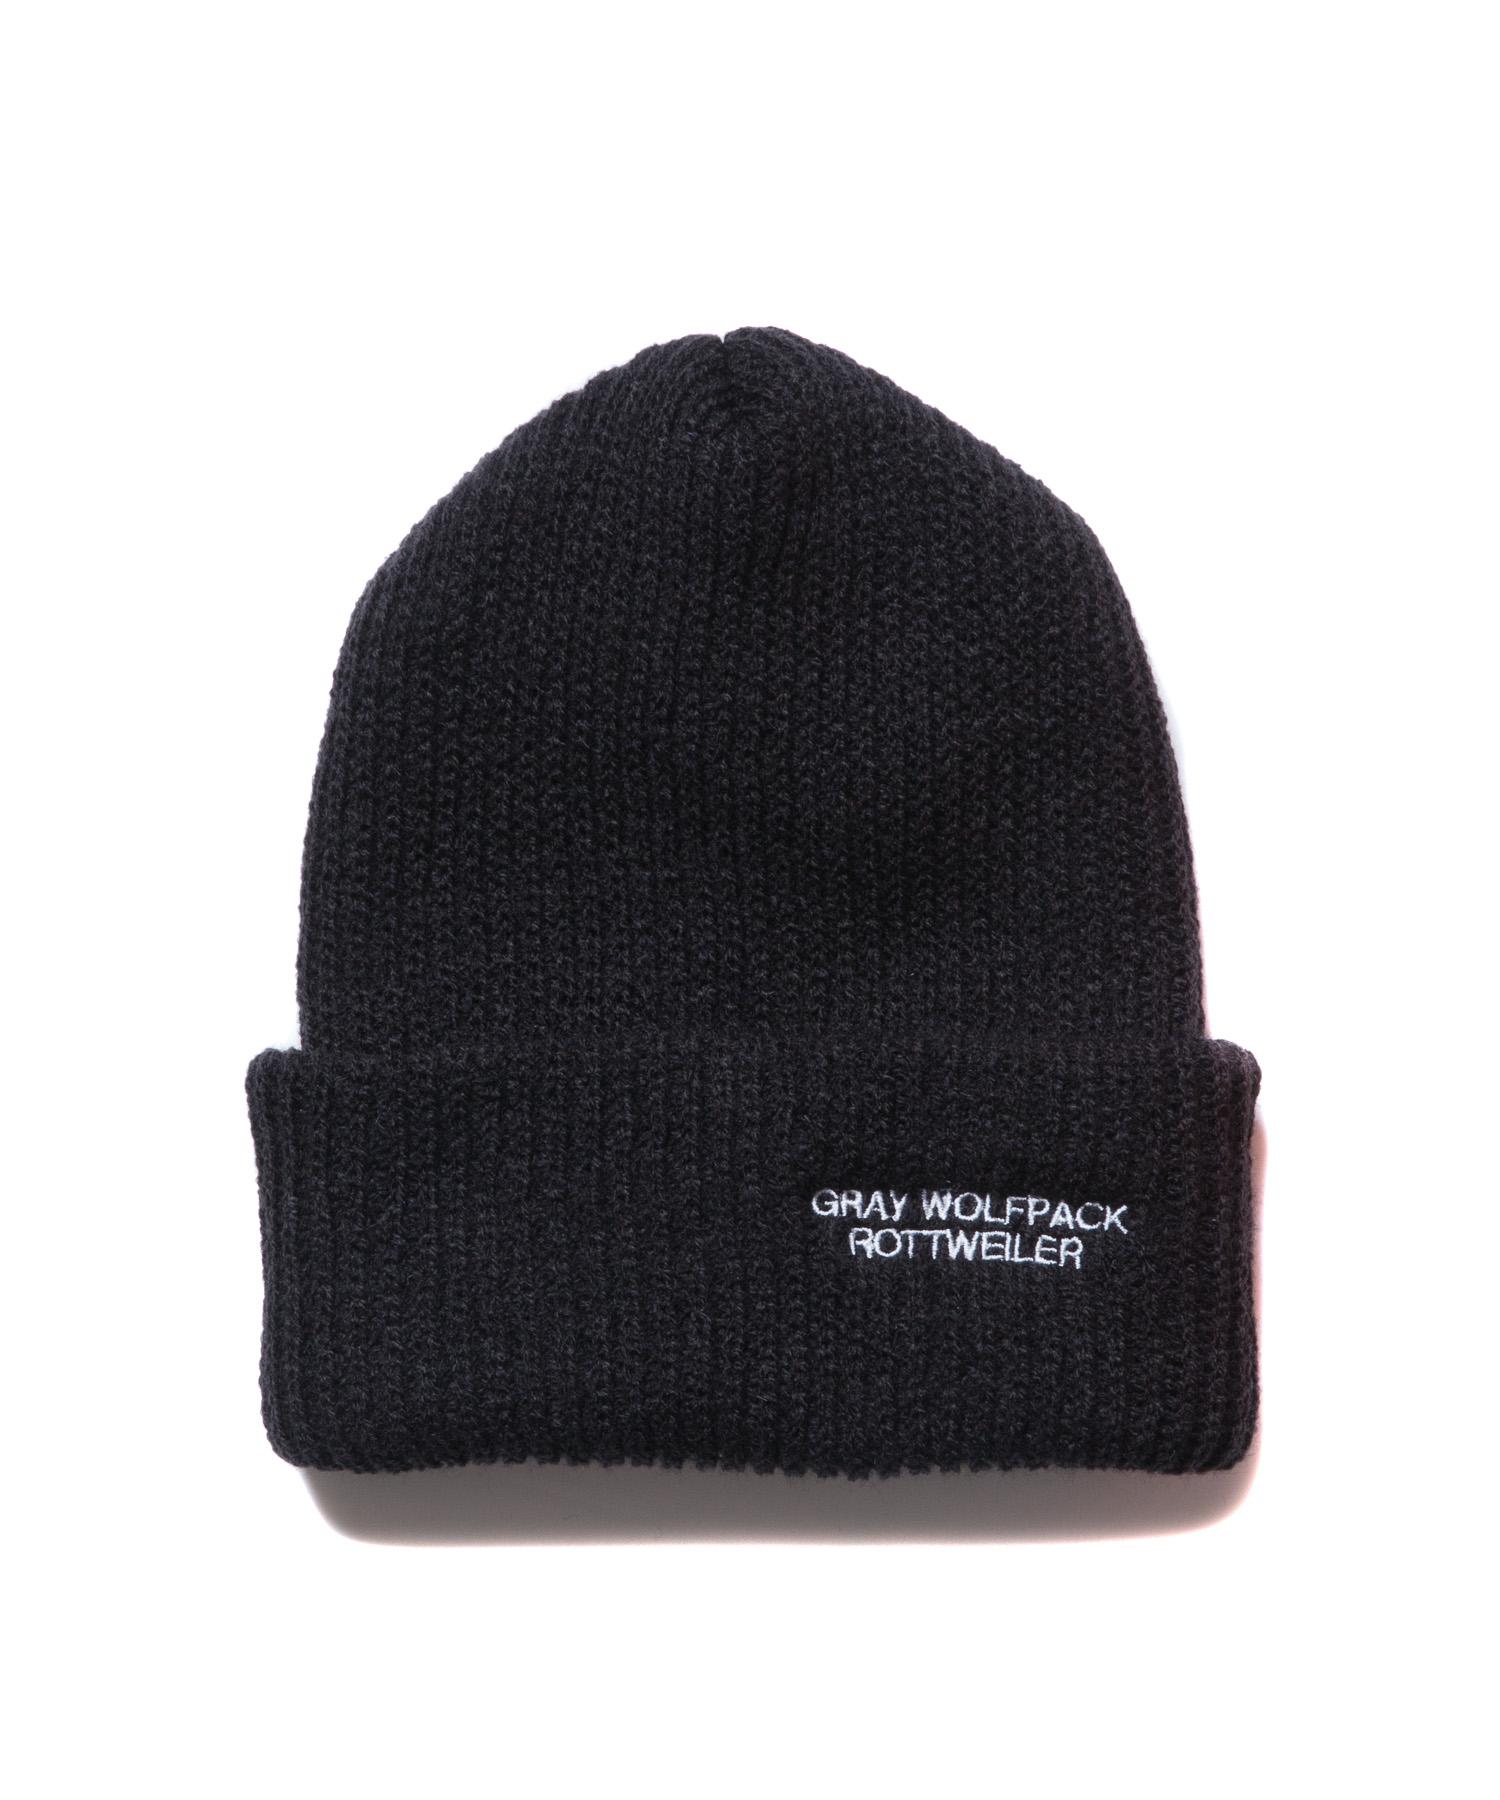 ROTTWEILER BRONER Wolfpack Knit Cap